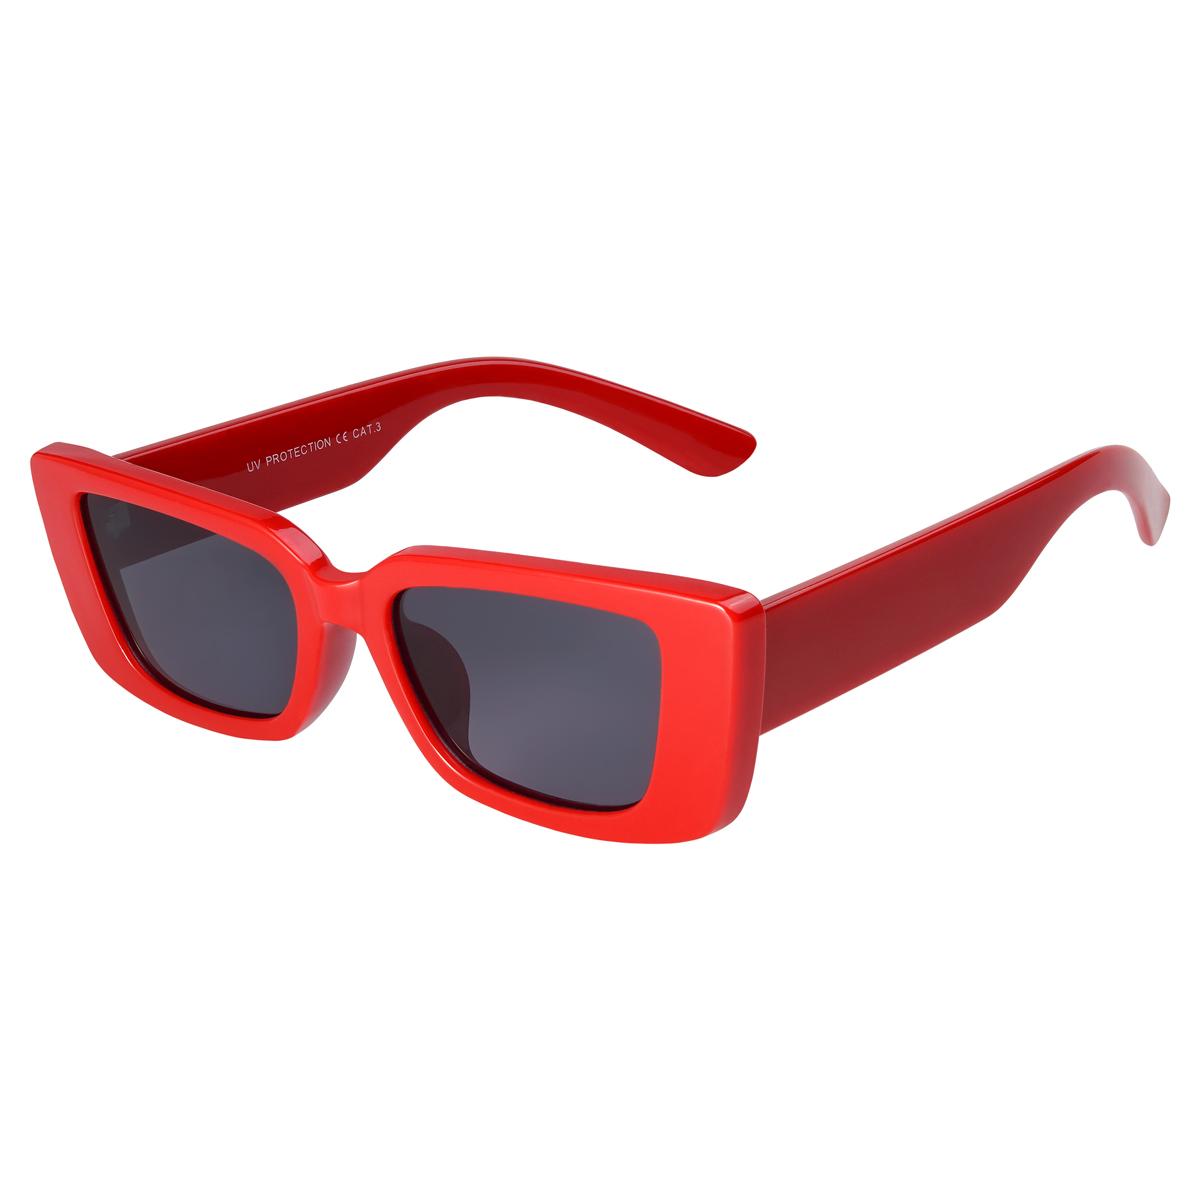 Sunglasses Trendy